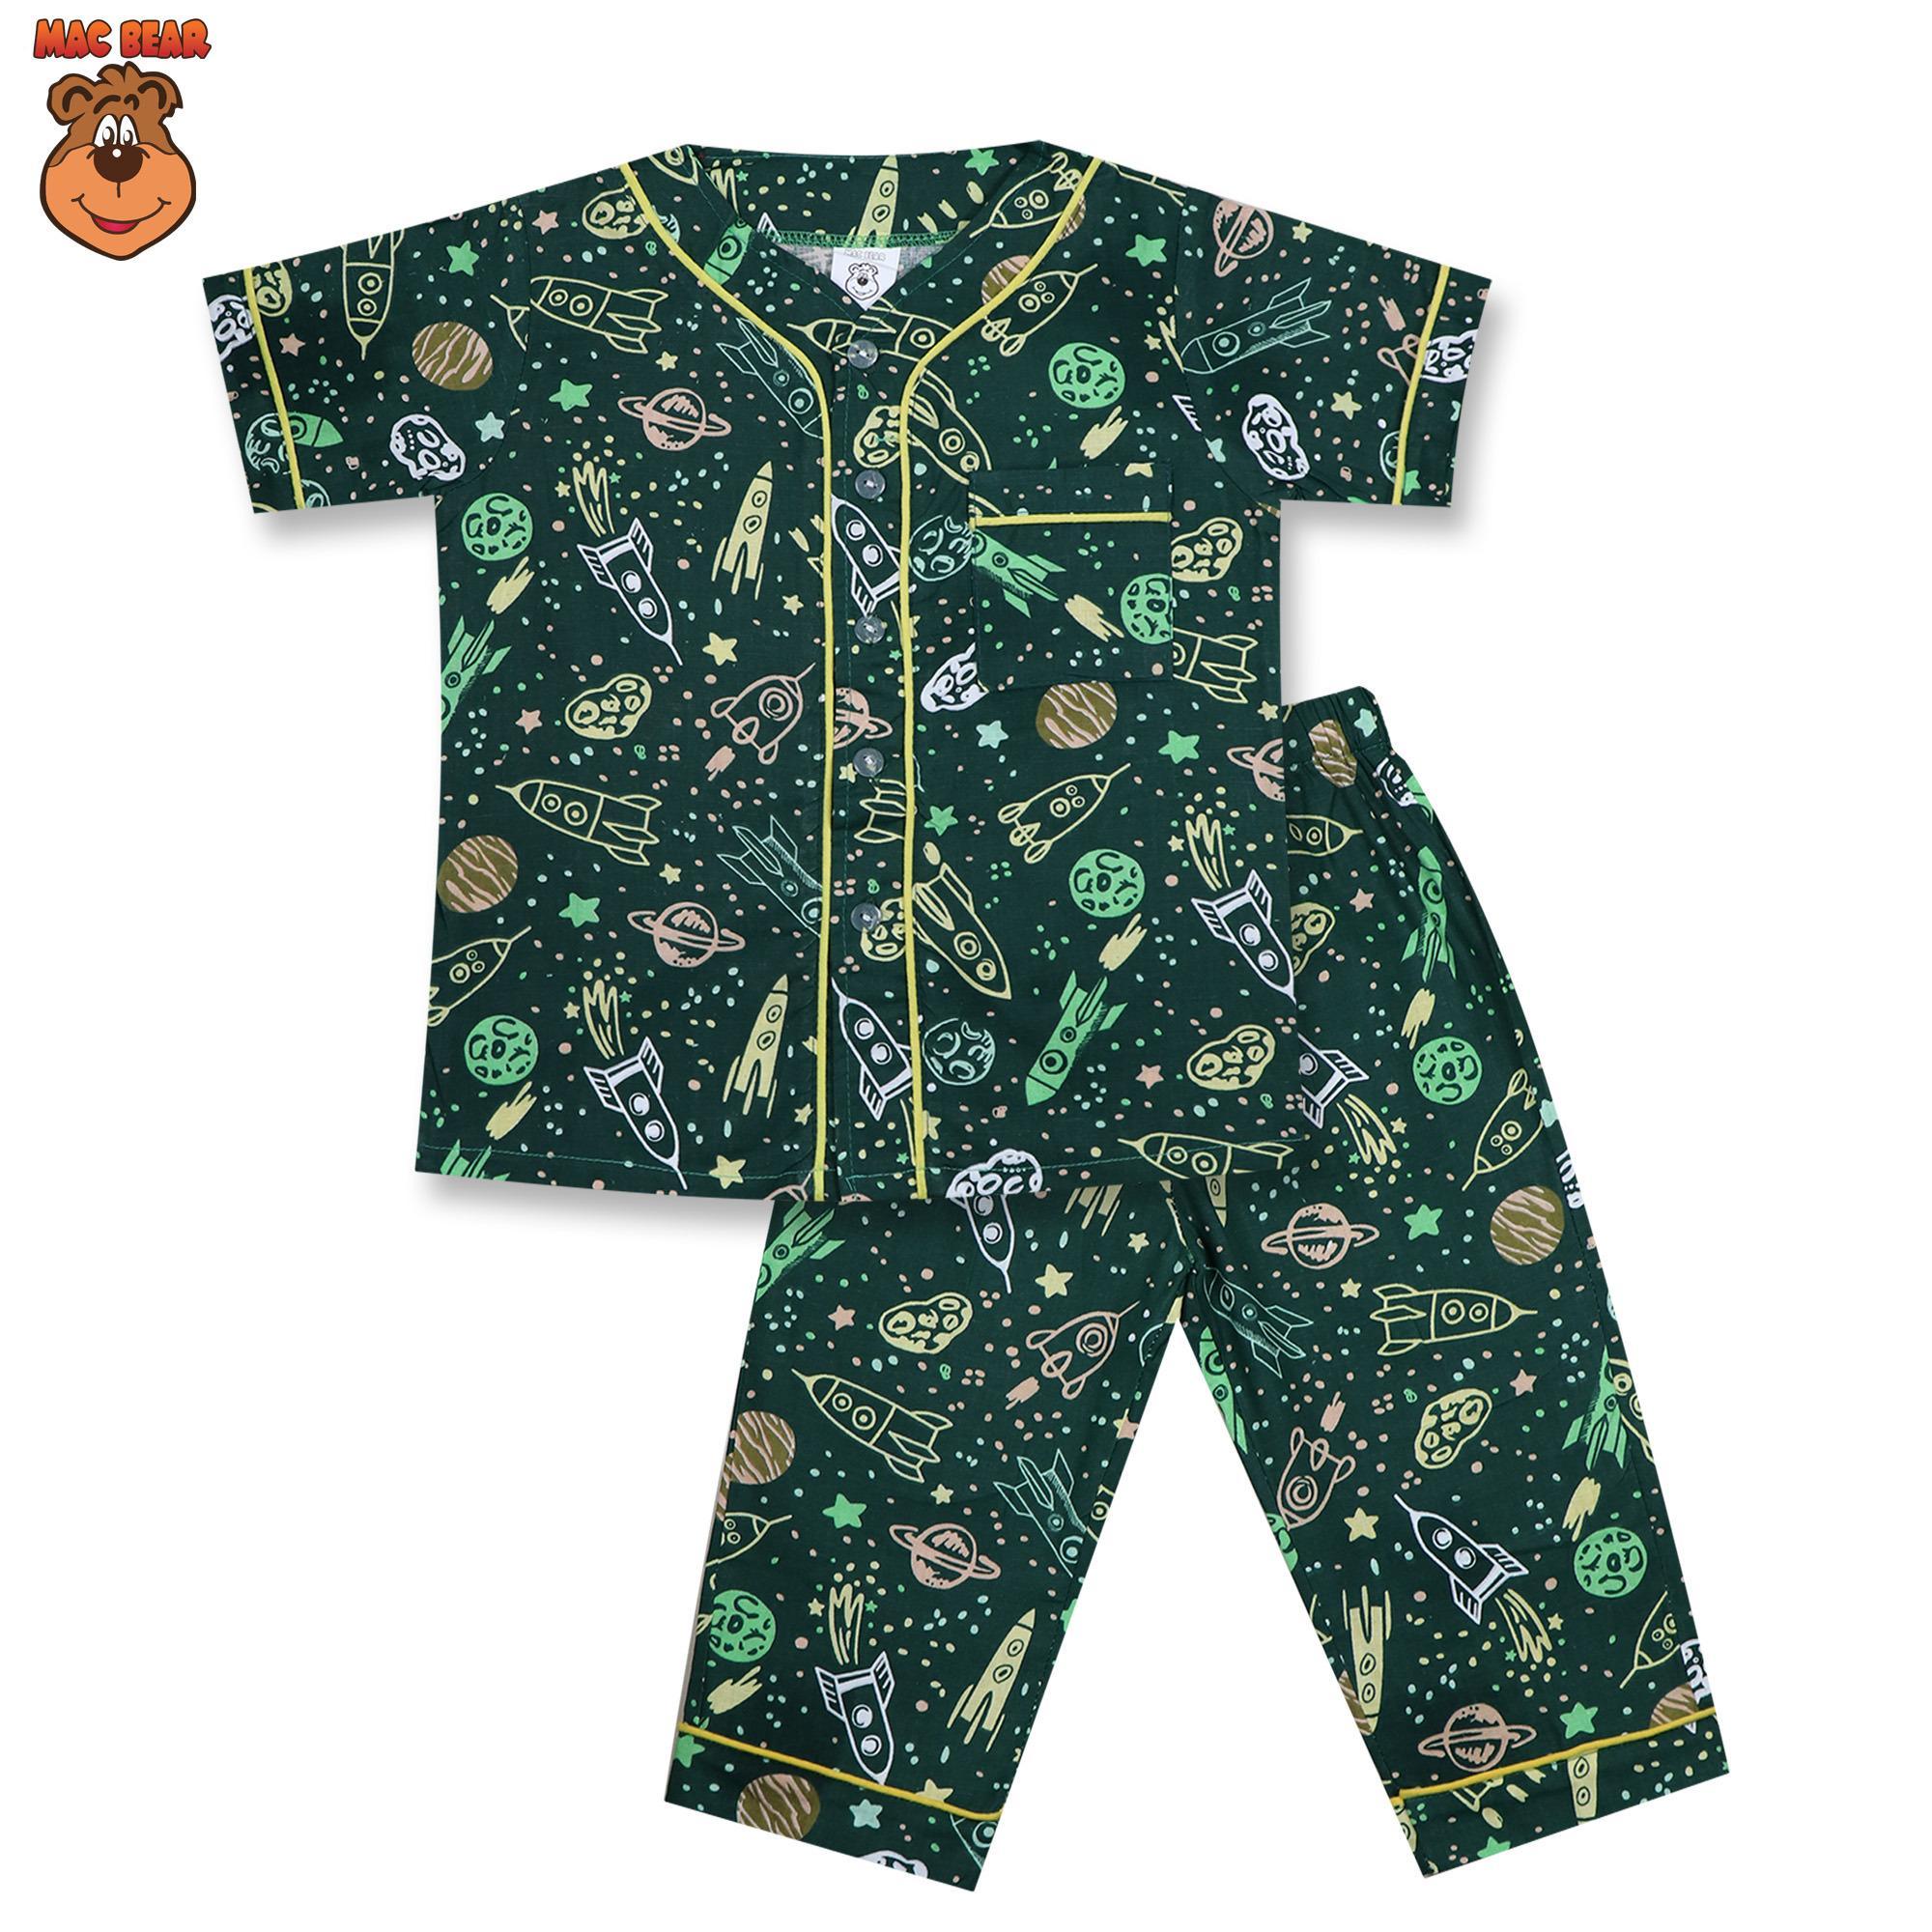 Macbear Baju Anak Ahoy Little Sailor Seahorse Set Daftar Harga Dx3 Kids Rainbow California Navy Size 1 Setelan Piyama Astronoutidr49975 Rp 49975